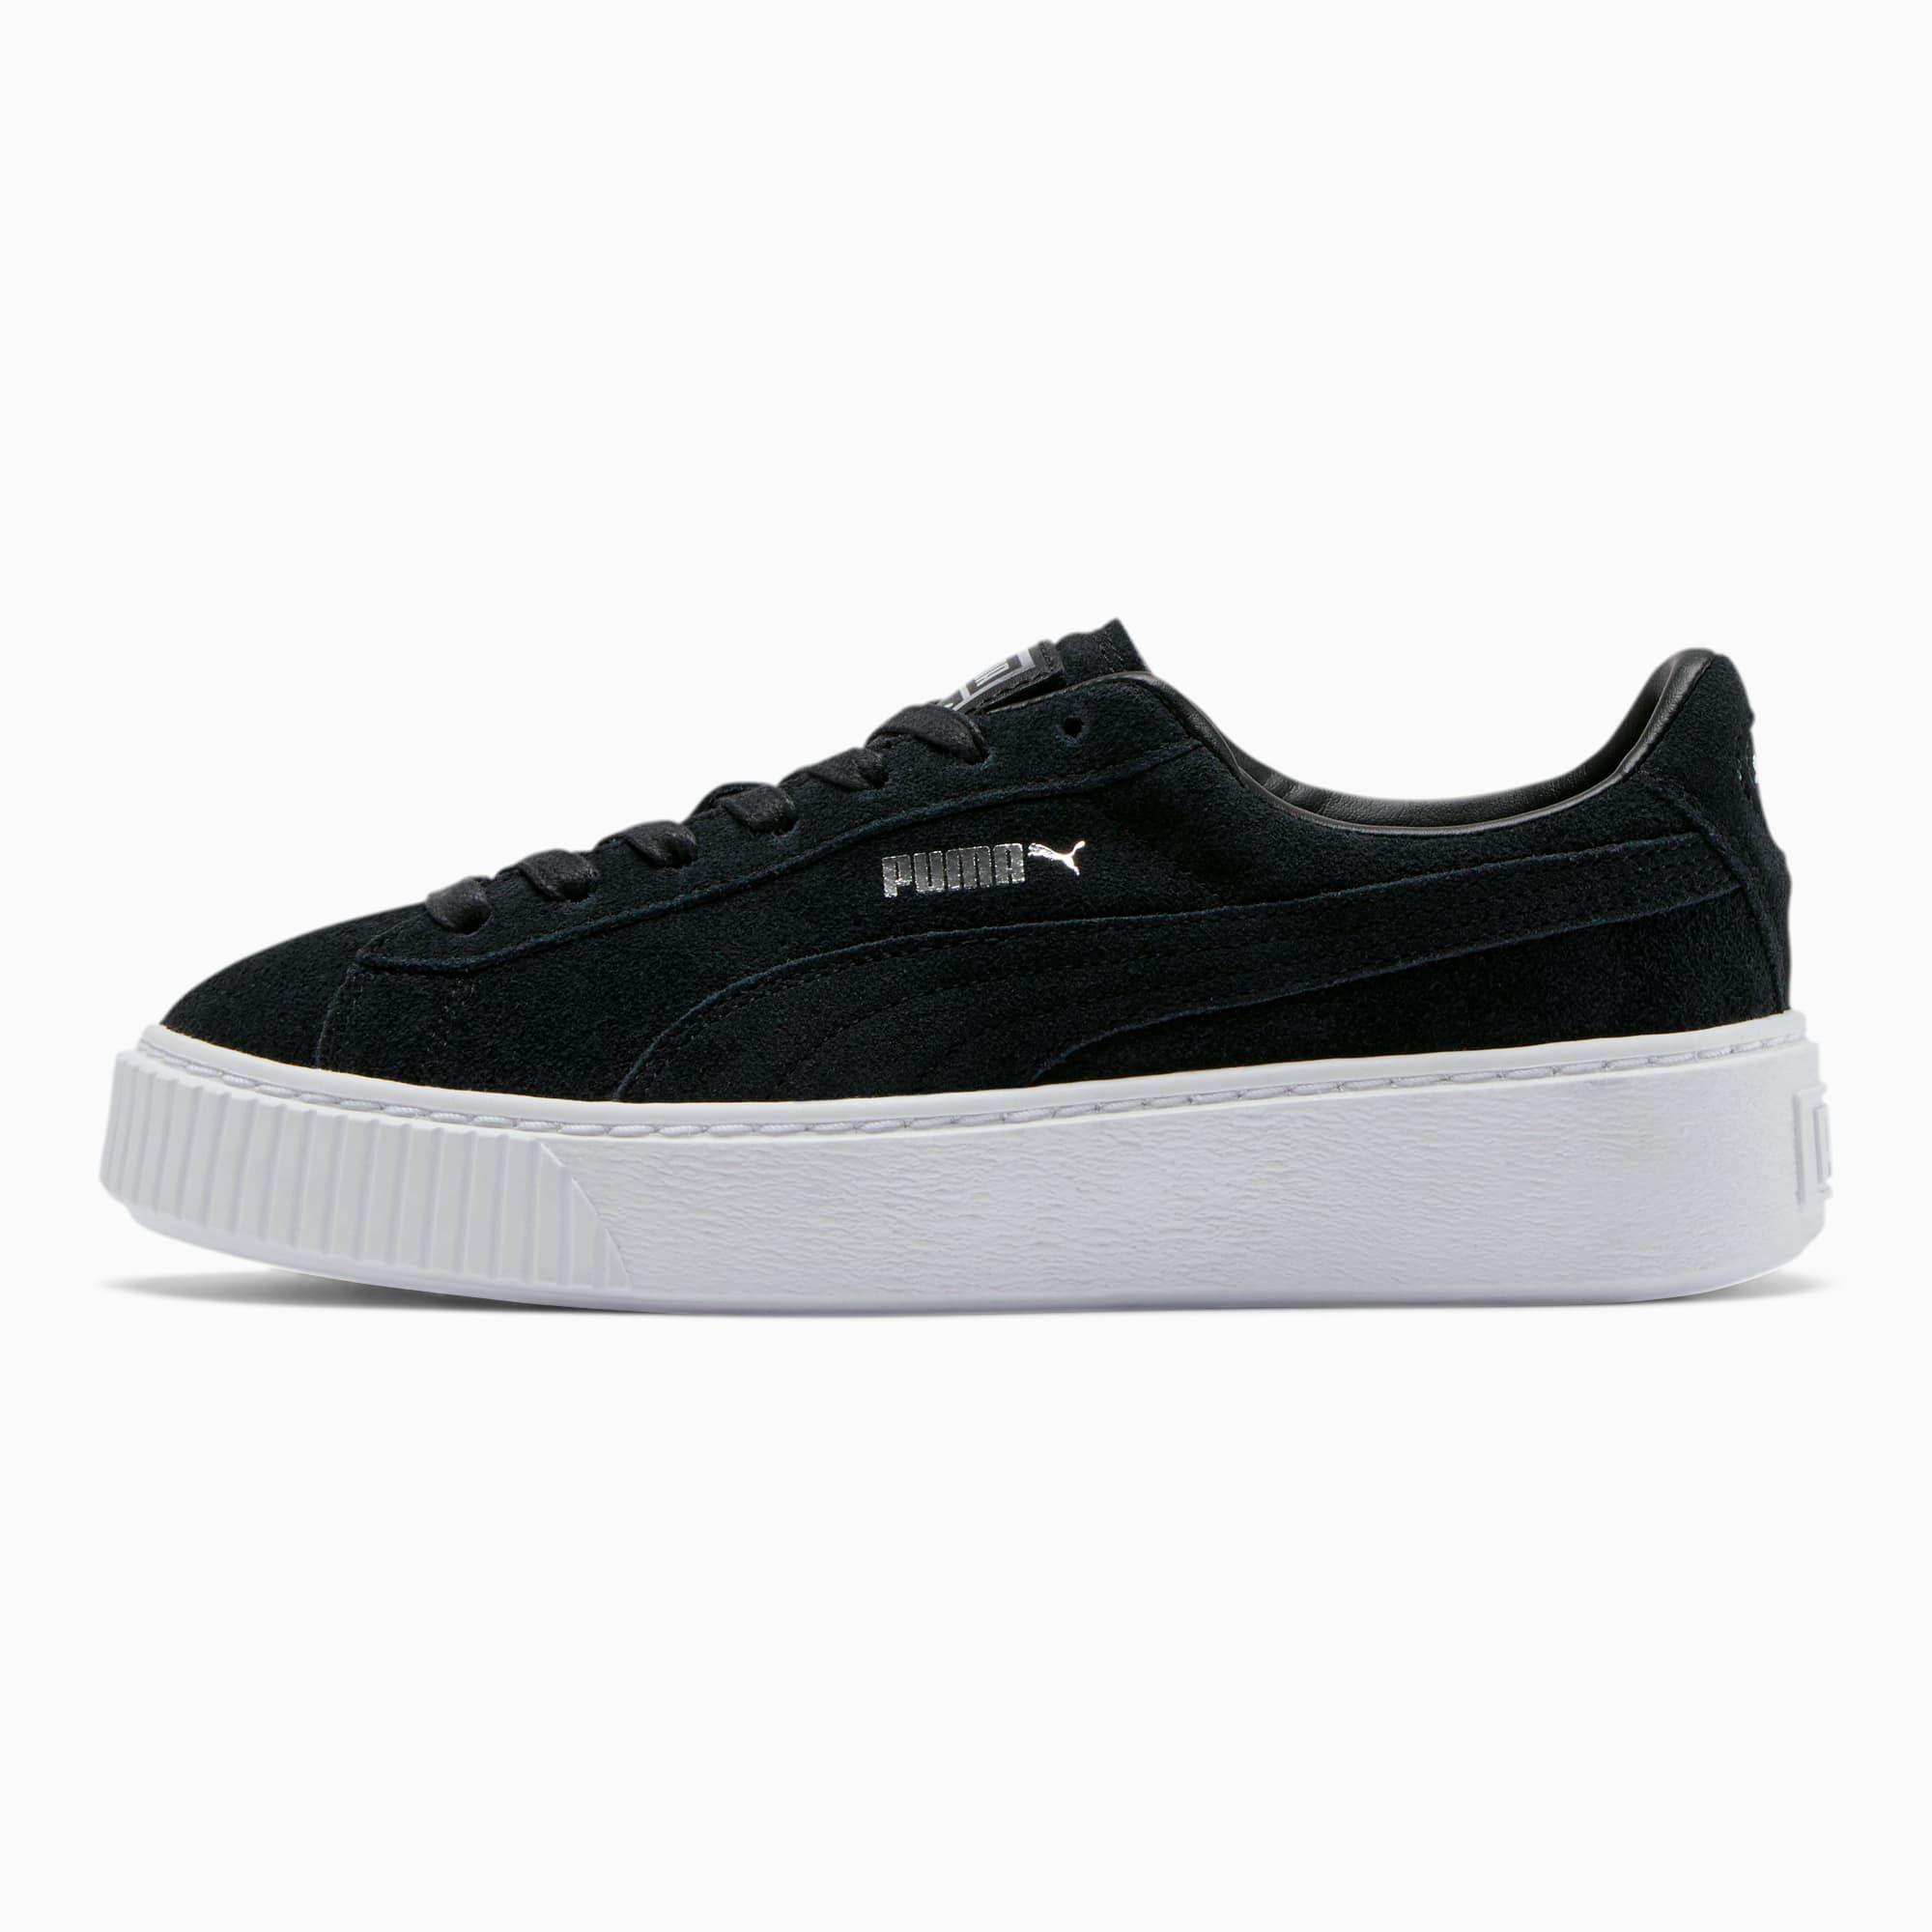 Suede Platform Women S Sneakers Puma Us Womens Sneakers Sneakers Womens Shoes High Heels